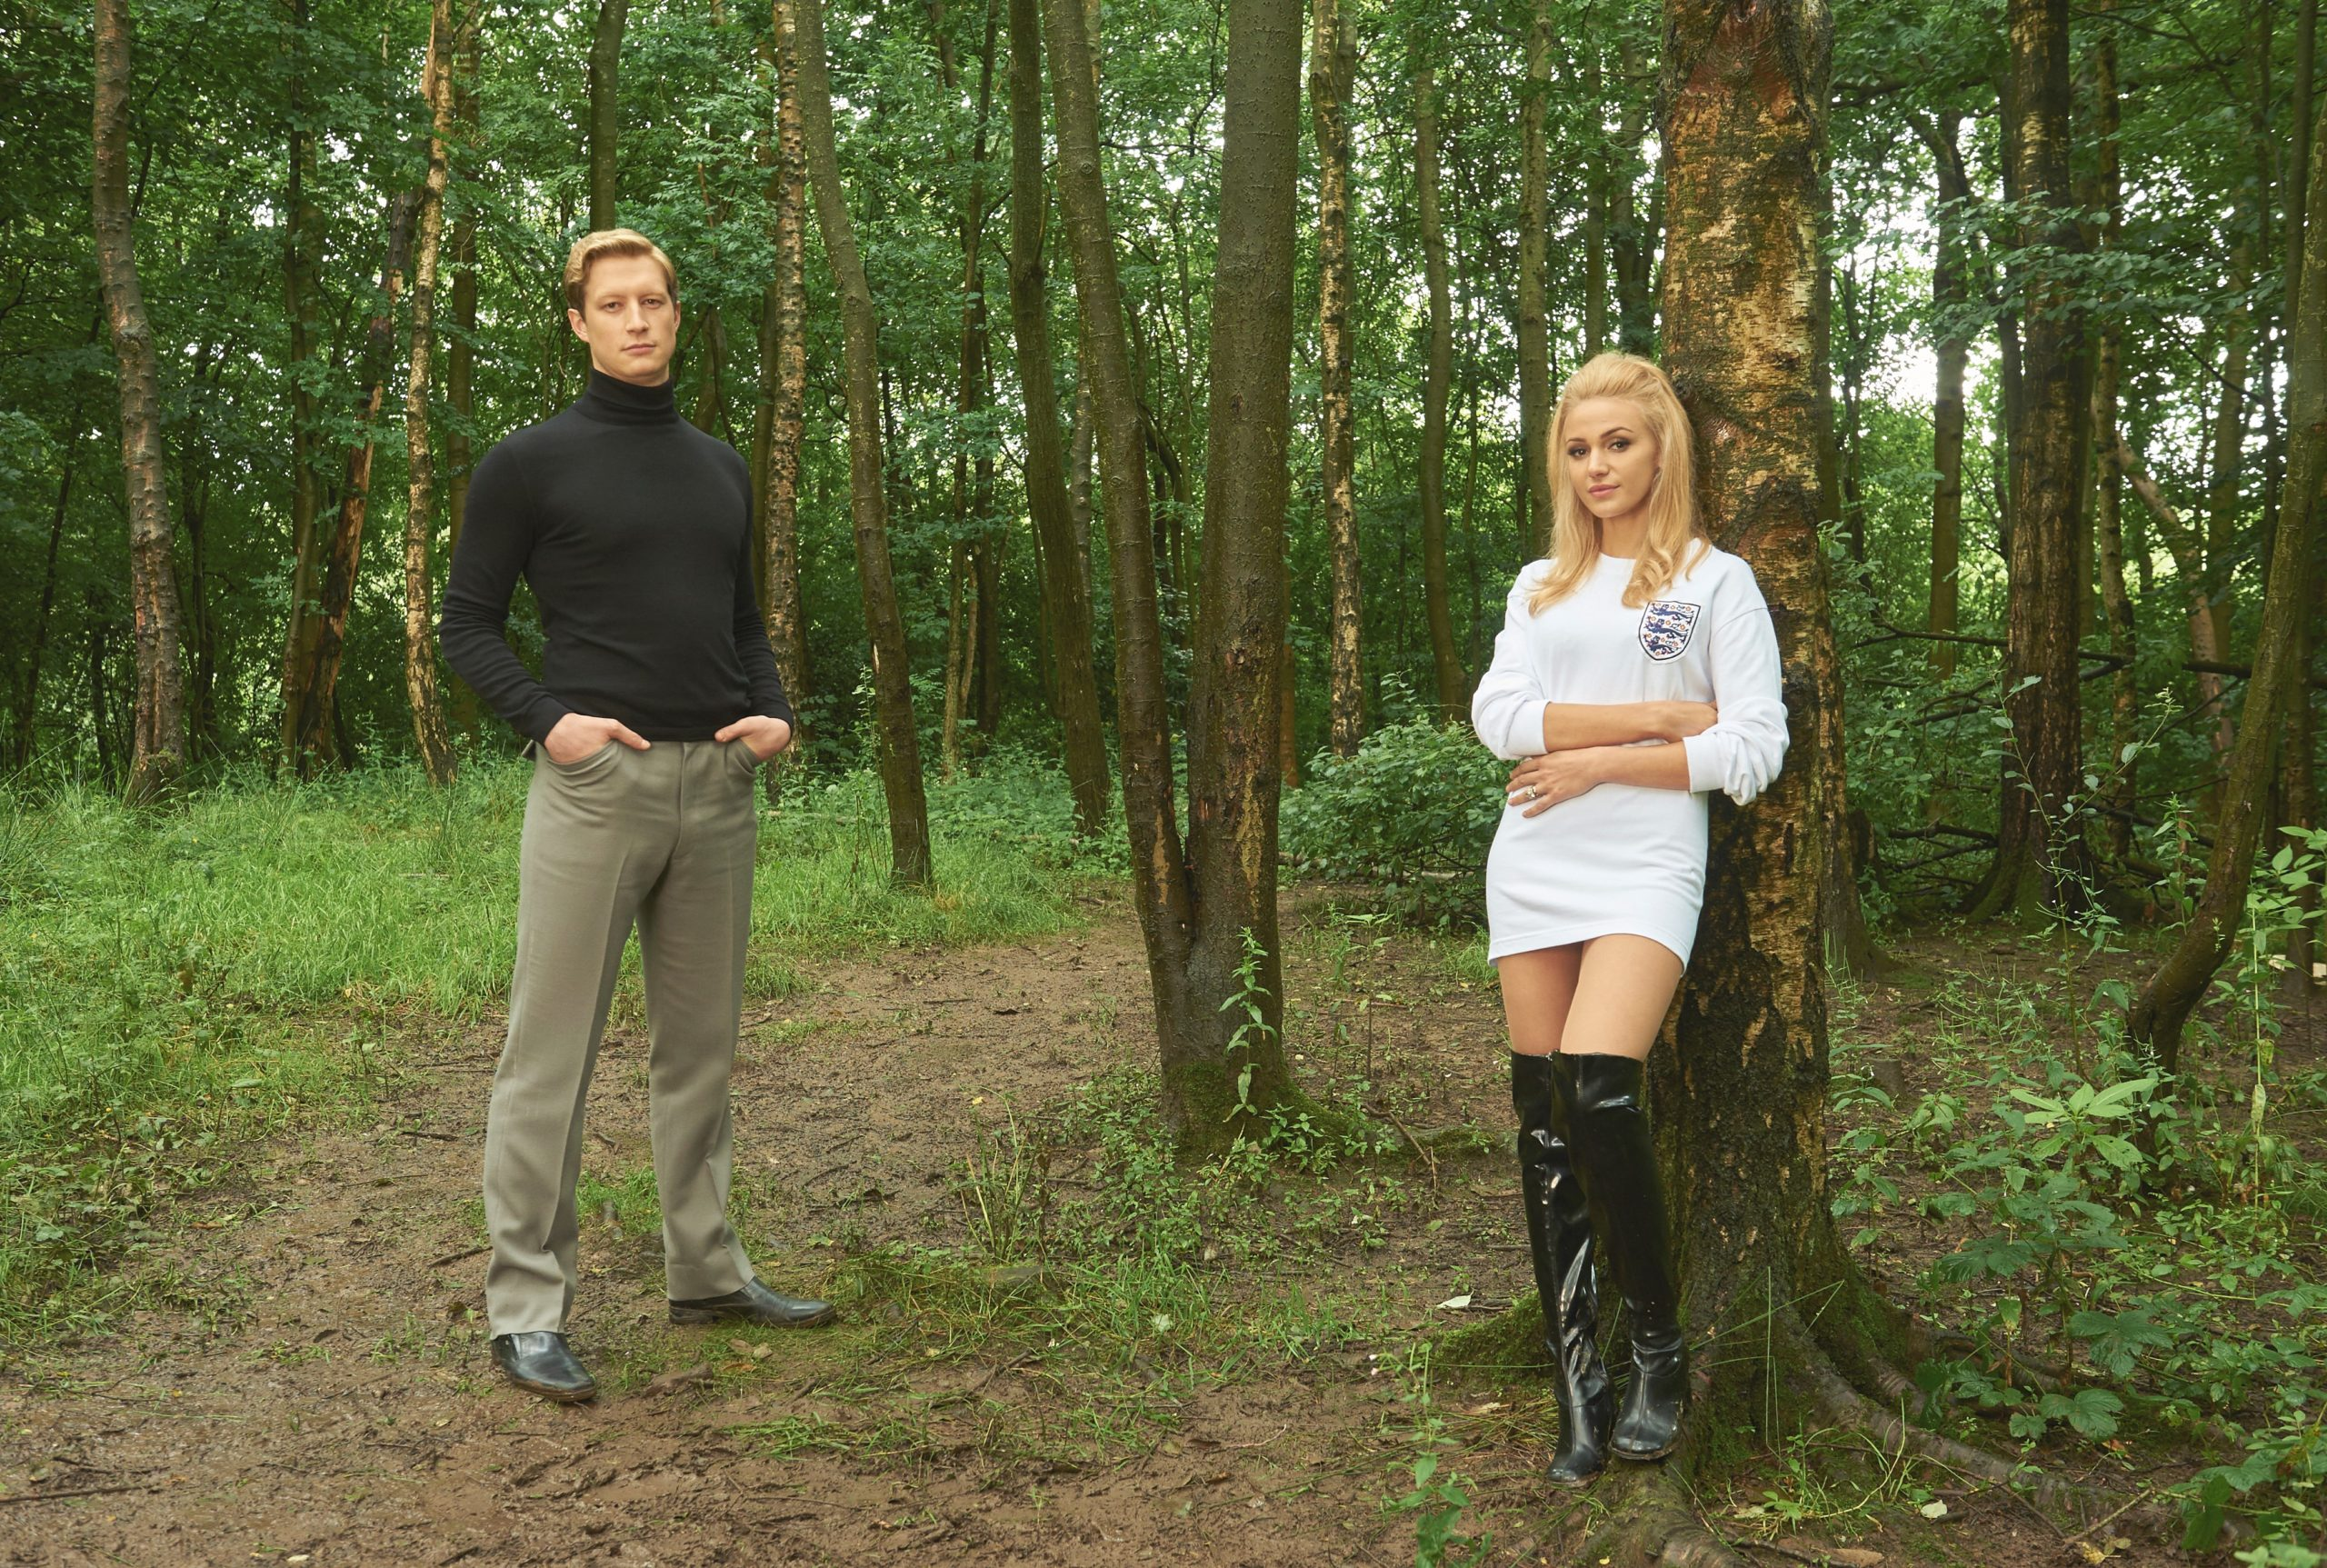 Tina and Bobby Michelle Keegan blonde hair